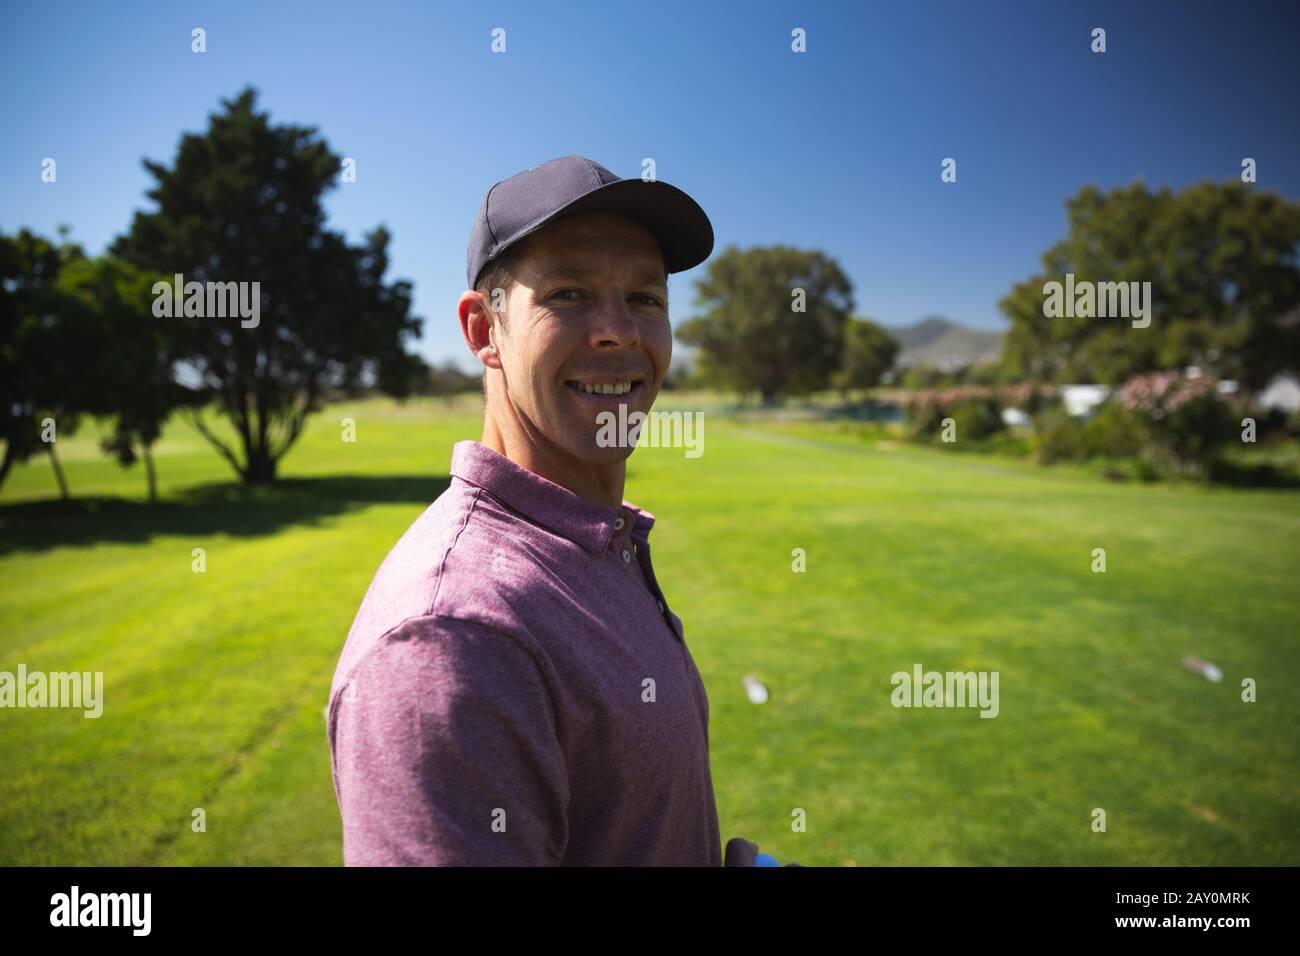 Golfer smiling and looking at camera Stock Photo